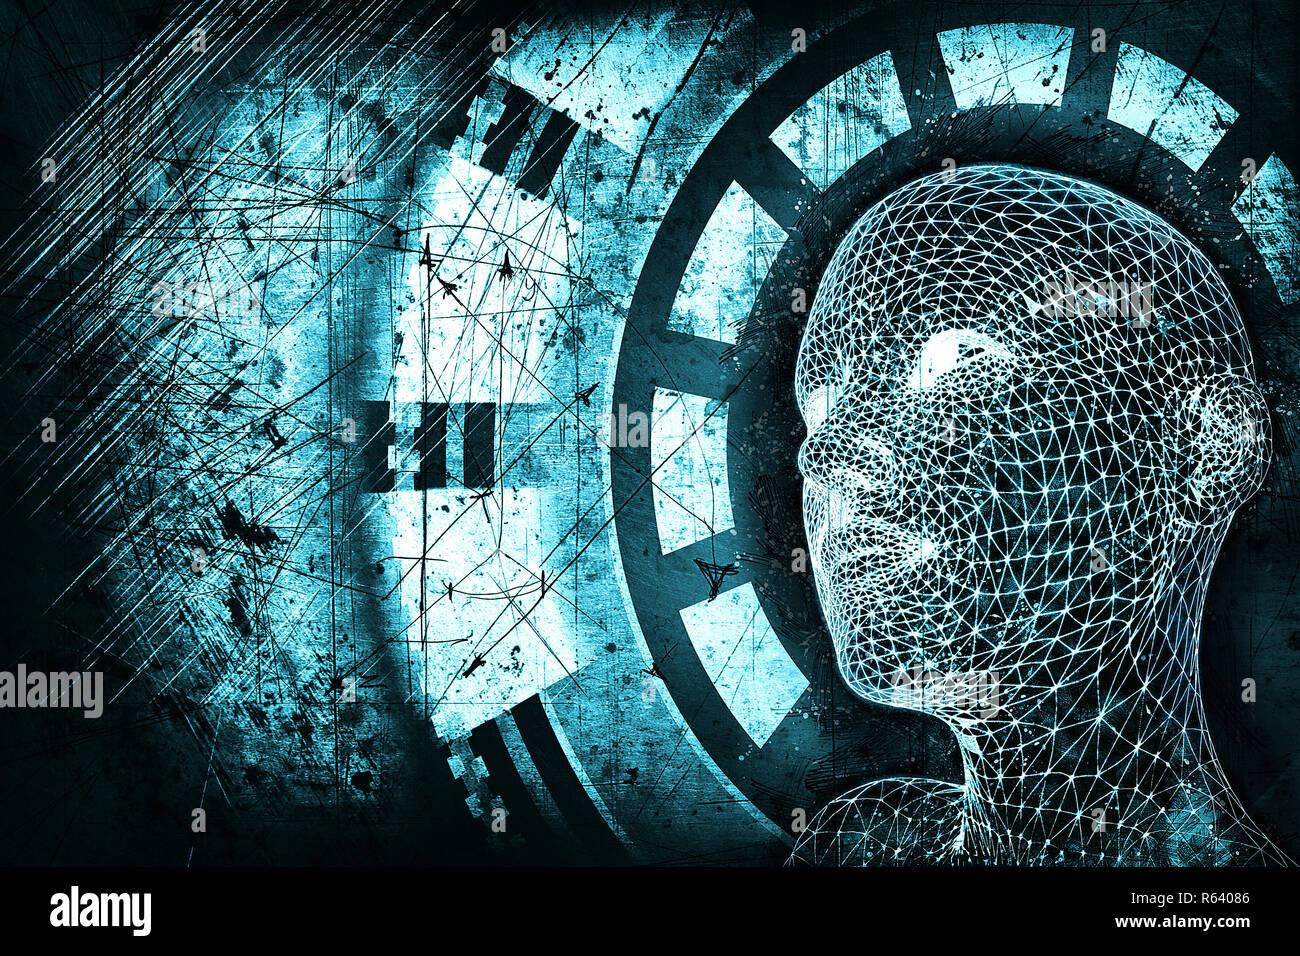 Abstract Blue Digital Human Head On Dark Grunge Background Robotics